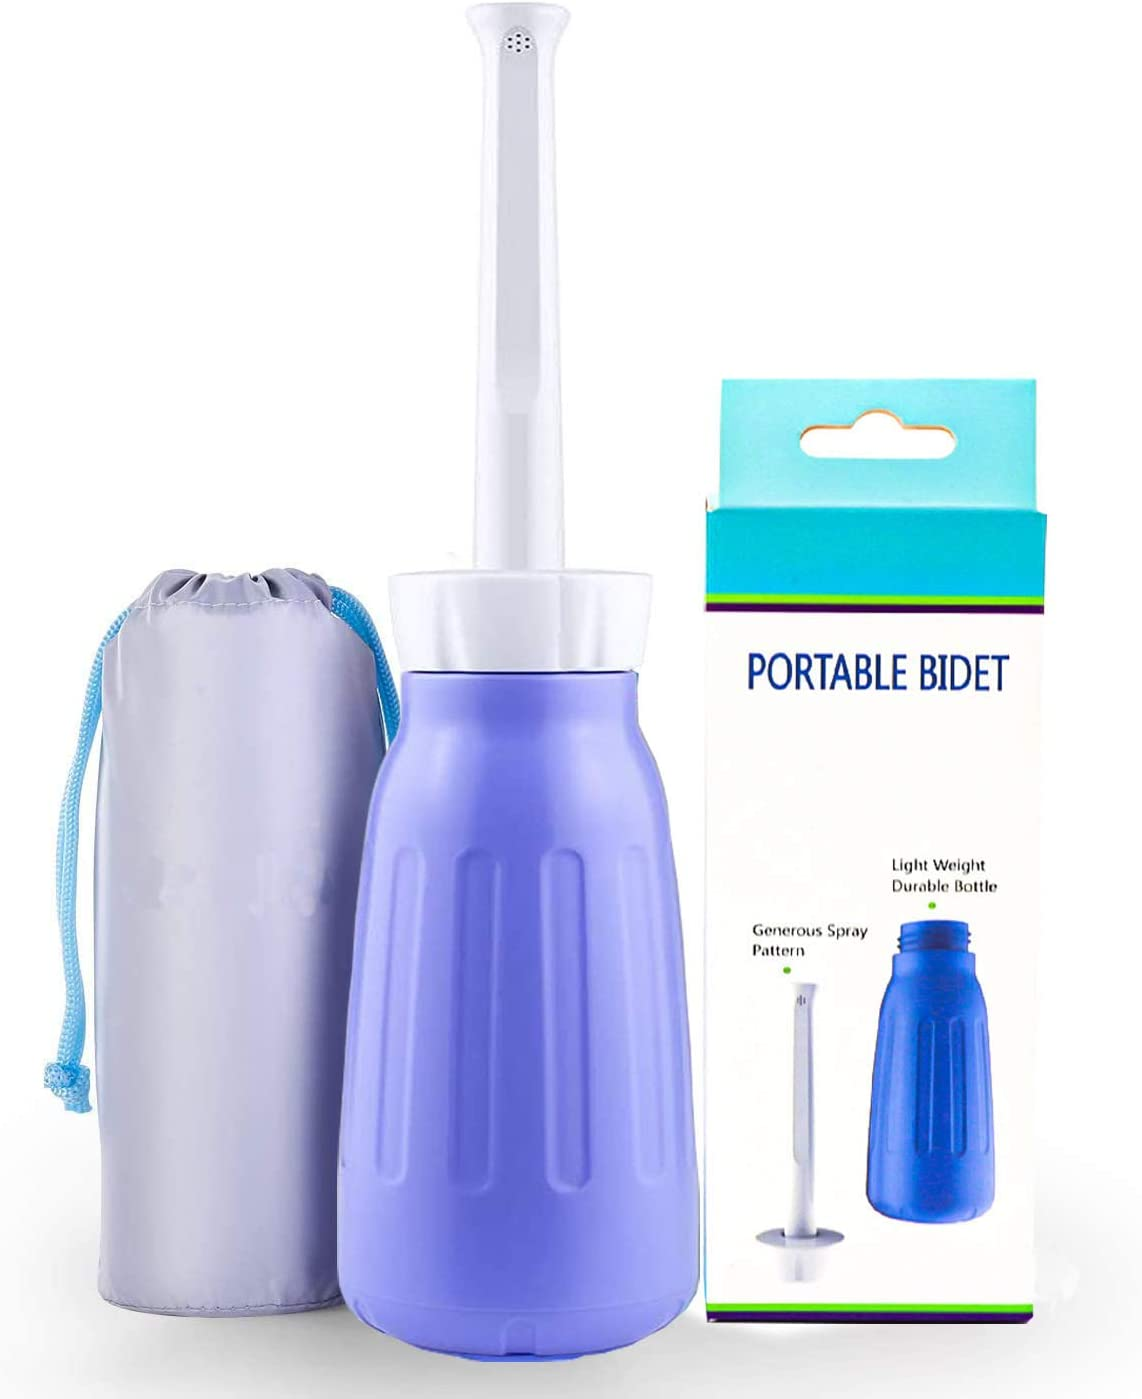 Portable Bidet 400ml Peri Bottle Postpartum Travel Bidet Bottle Partum Essentials with Telescoping Nozzle for Postpartum with Storage Bag Peri Bottle